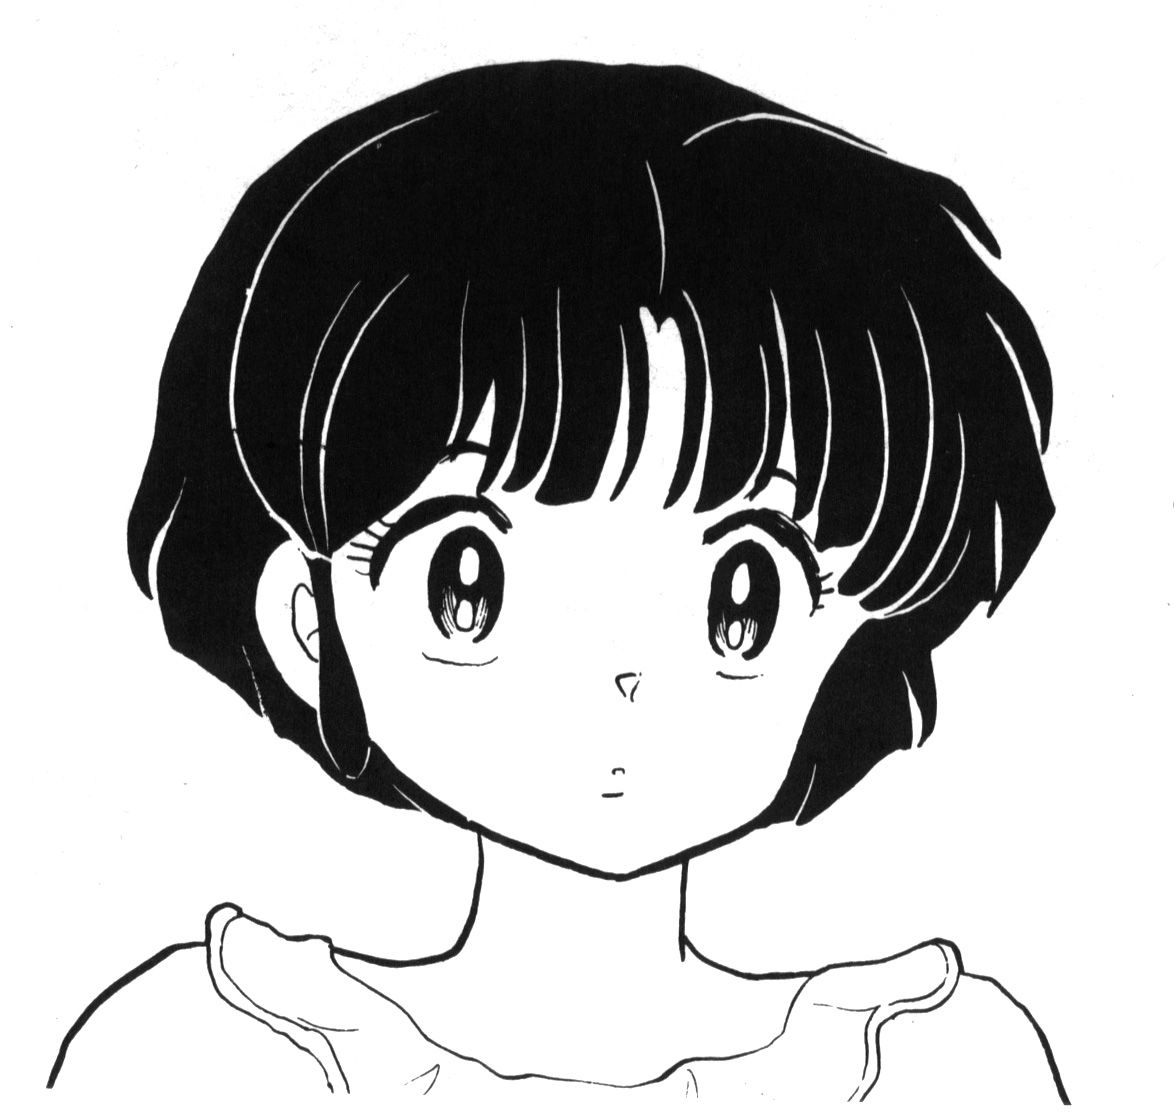 ranma 1 2 coloring pages | Akane Tendo, Ranma 1/2 | Ranma 1/2 | Manga anime, Akane ...